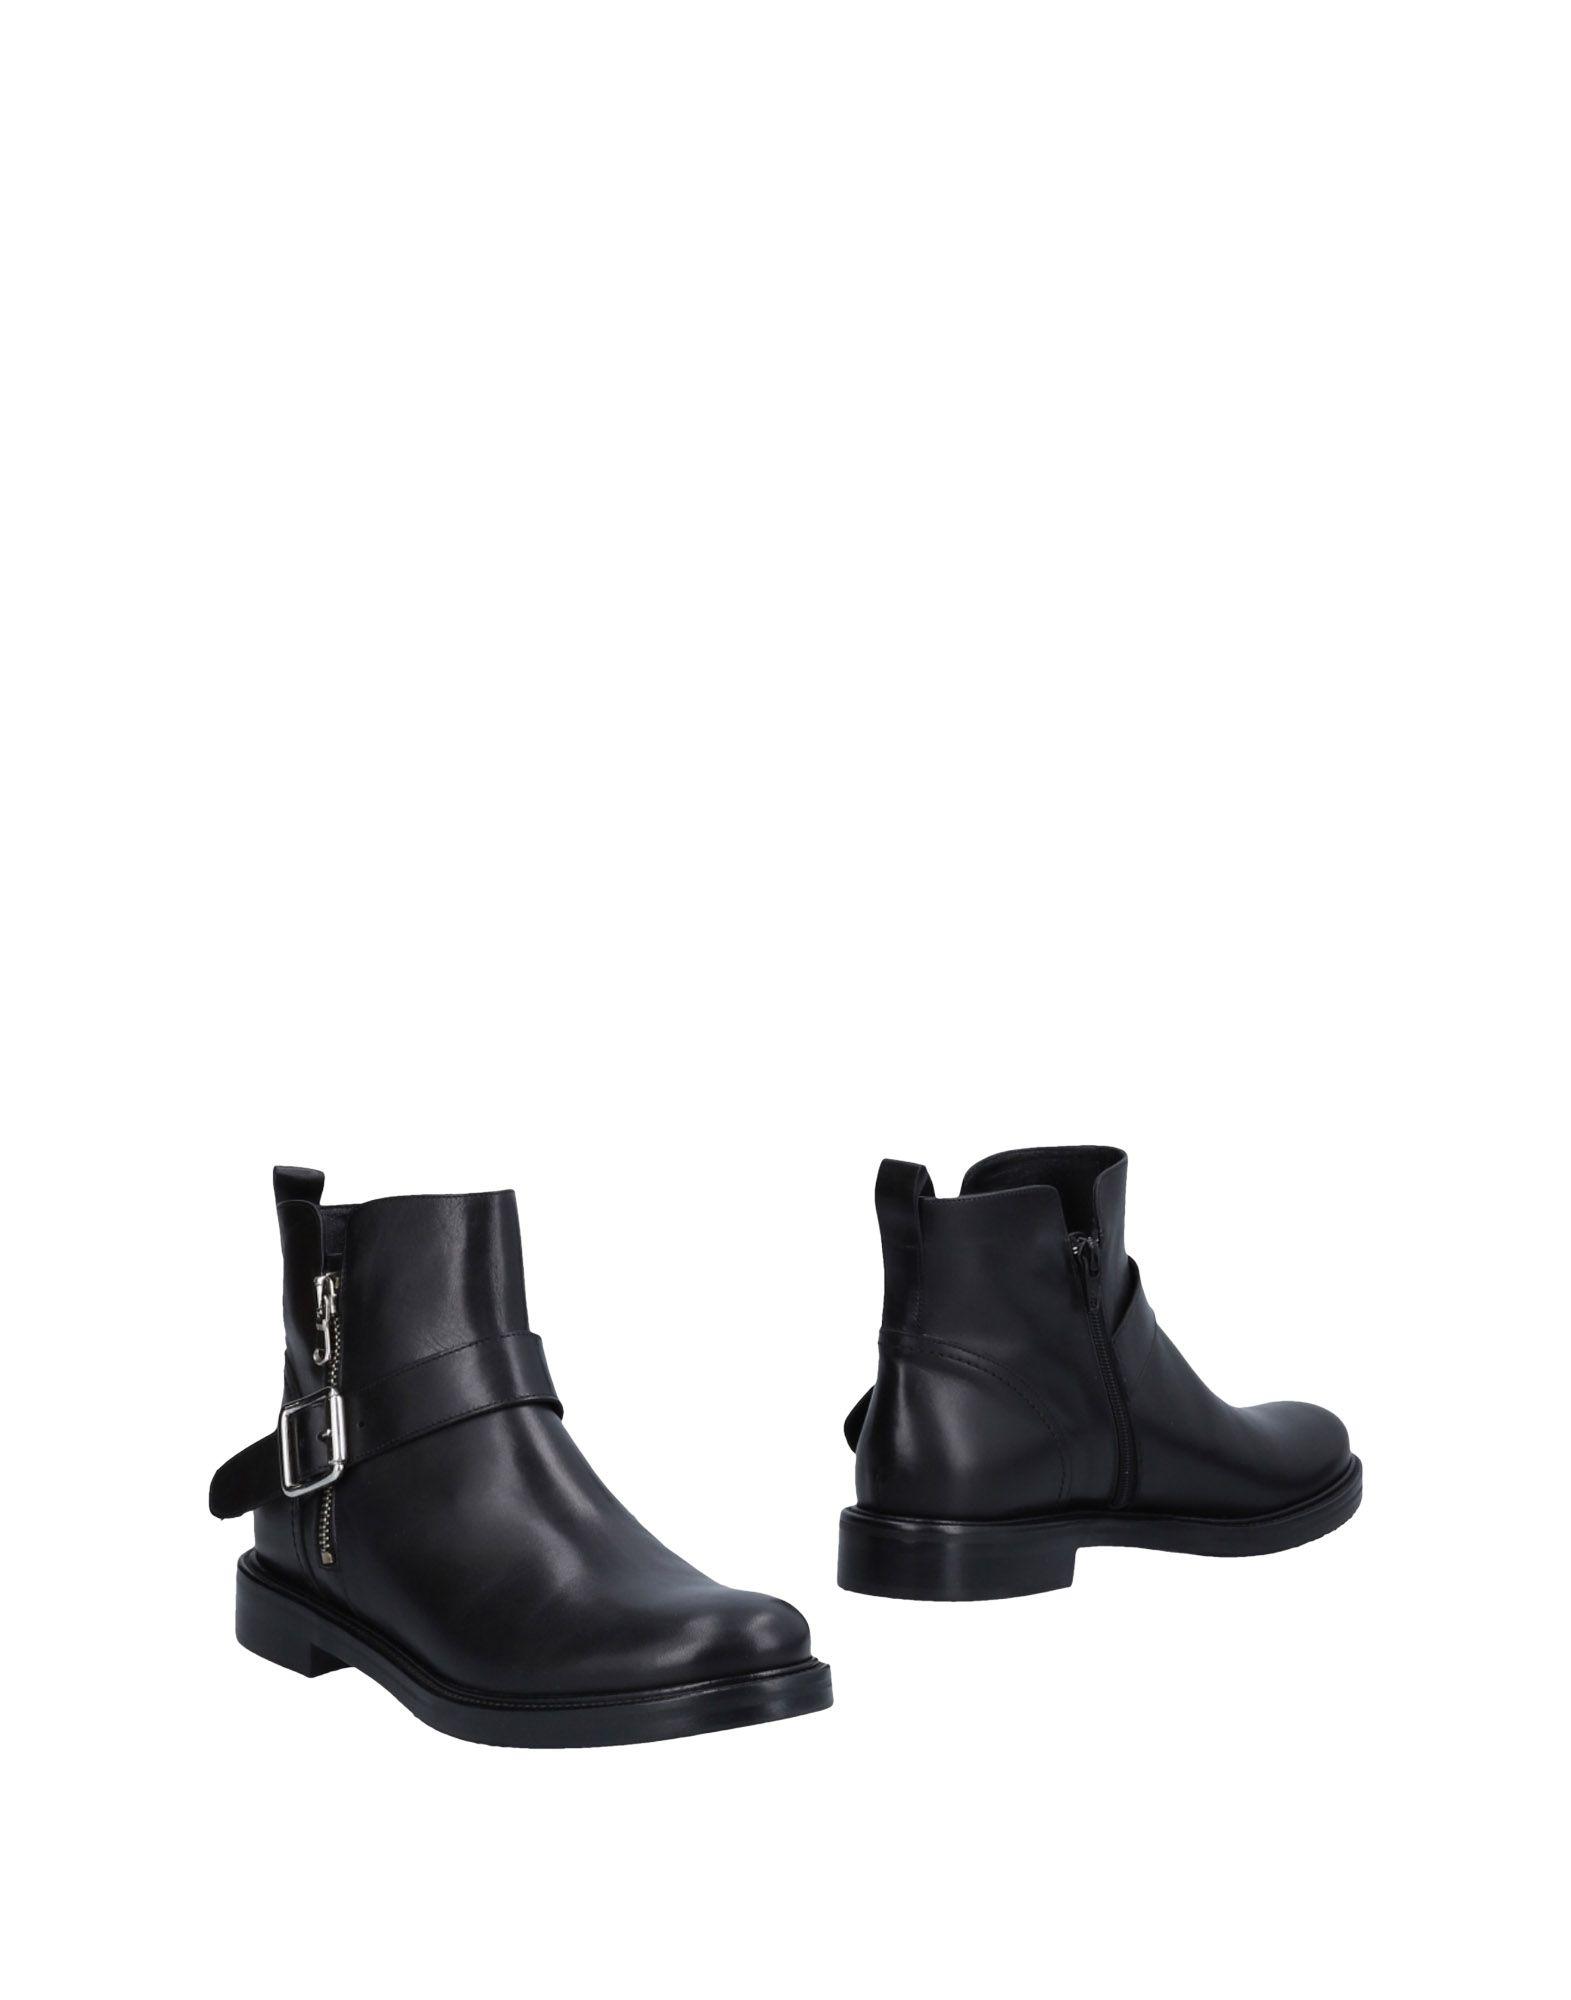 GUGLIELMO ROTTA Полусапоги и высокие ботинки цены онлайн